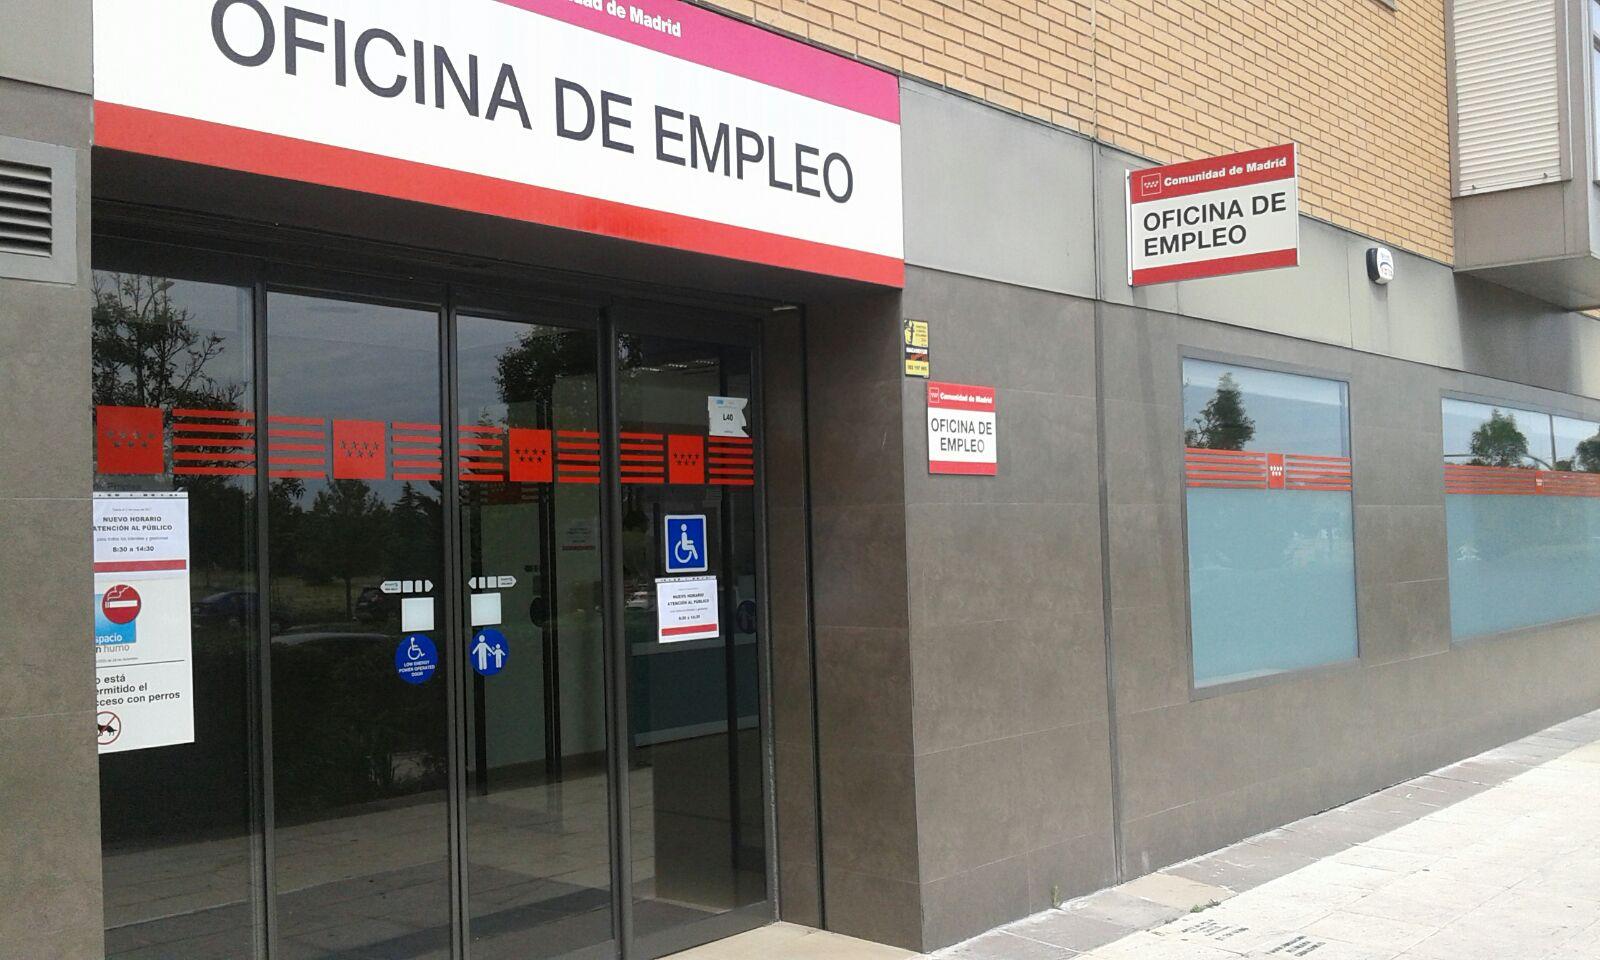 Oficina de Empleo en Sanchinarro (Madrid)